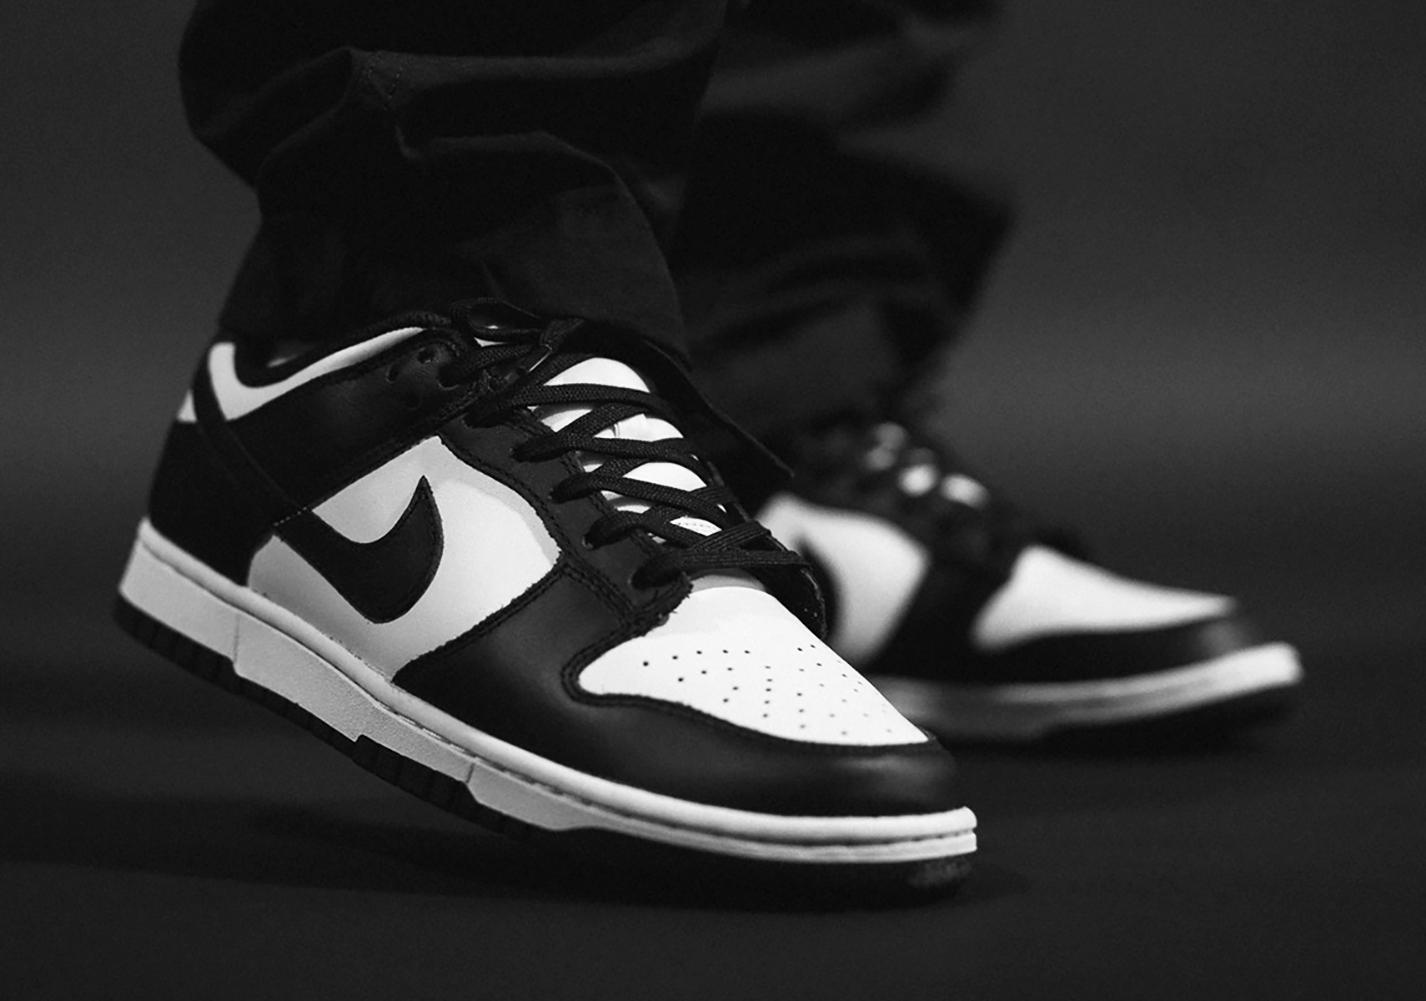 Nike-Dunk-Low-Black-White-Store-List-0_dunk_d